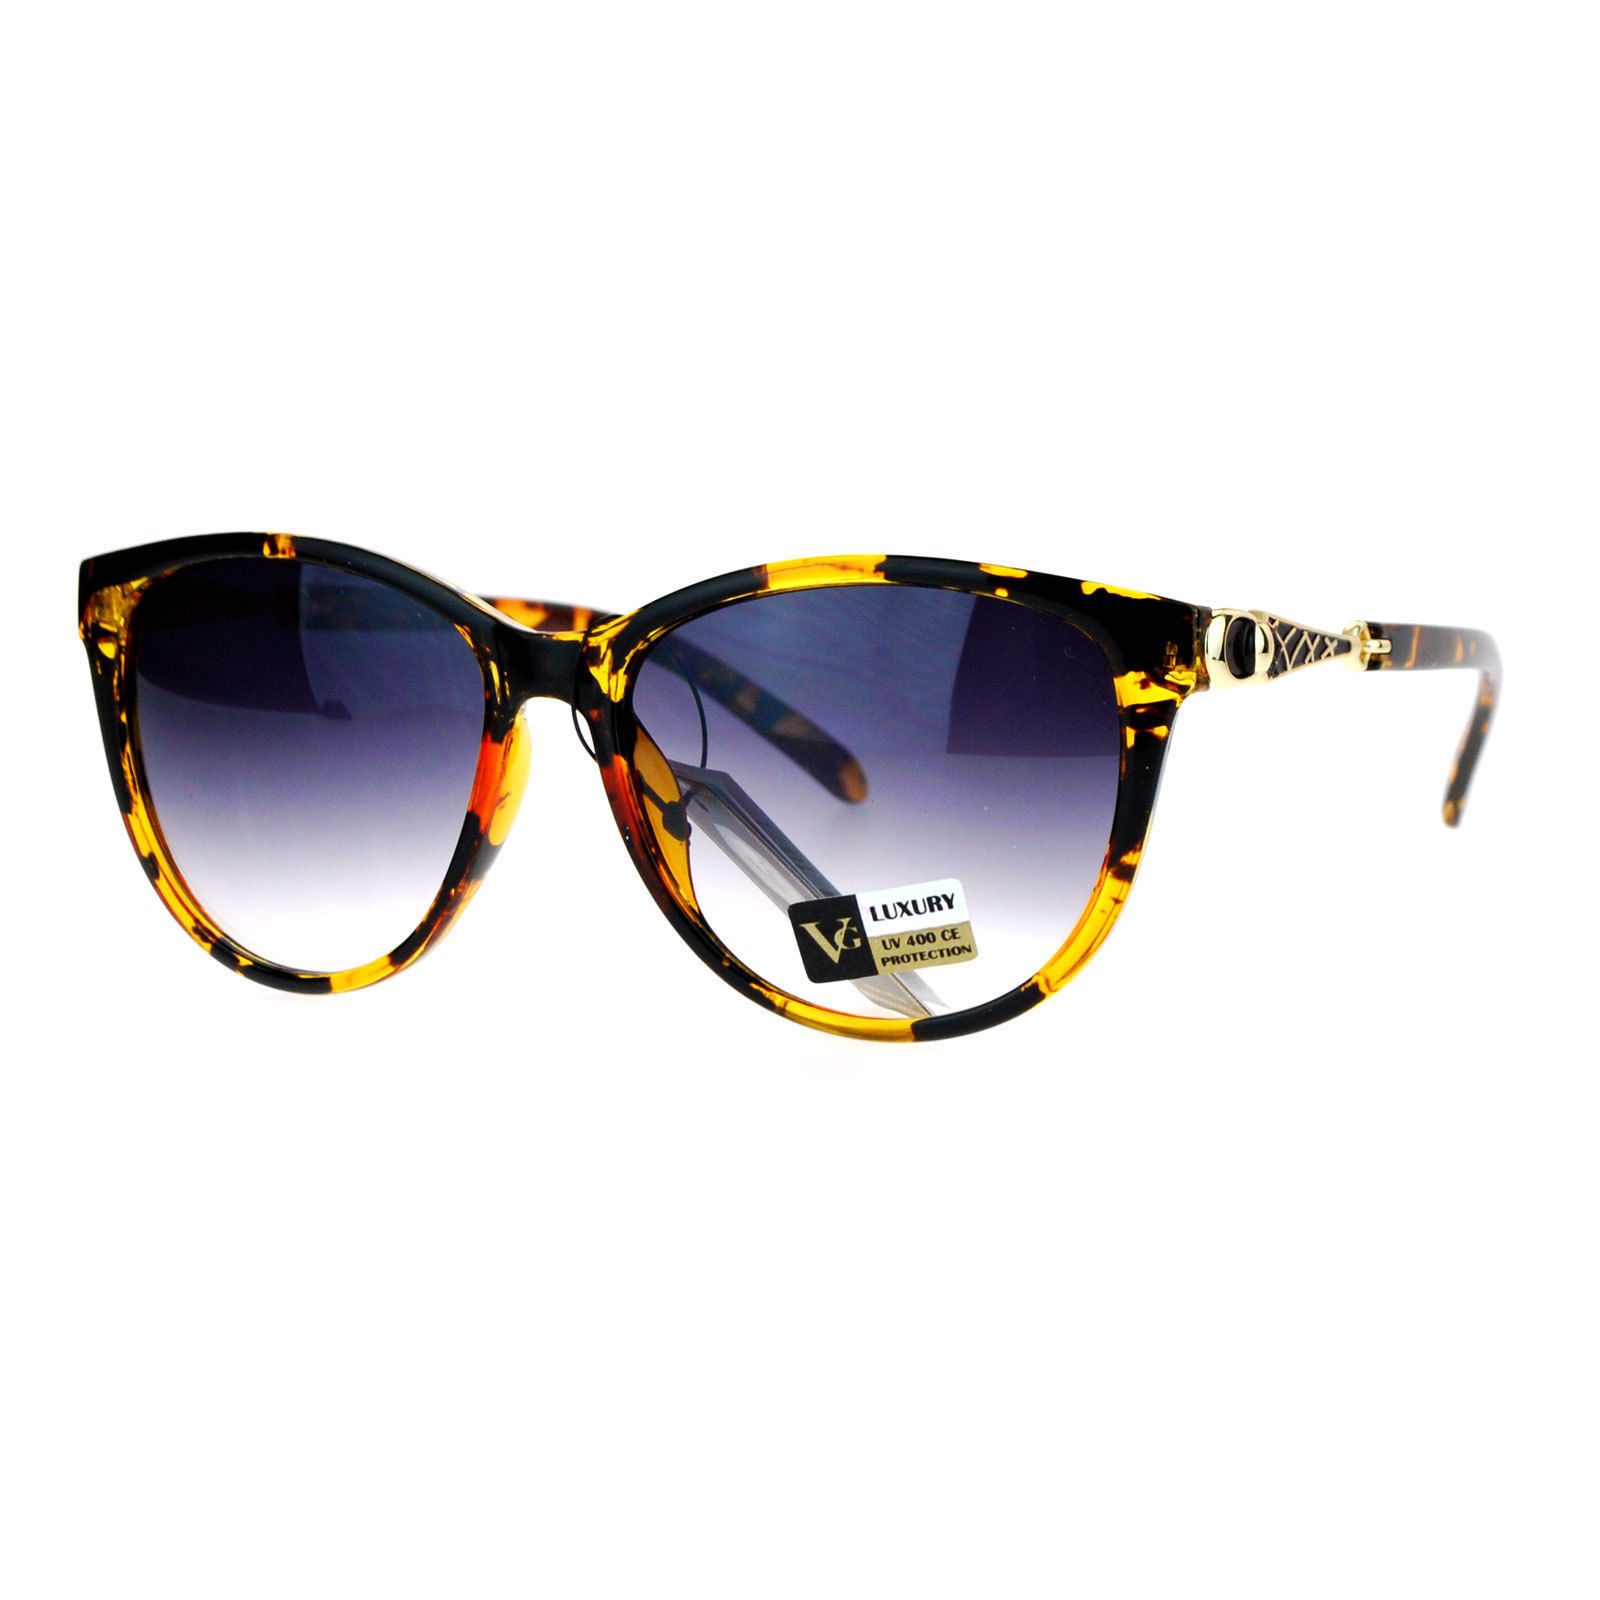 VG Occhiali Womens Fashion Sunglasses Classic Designer Style Shades